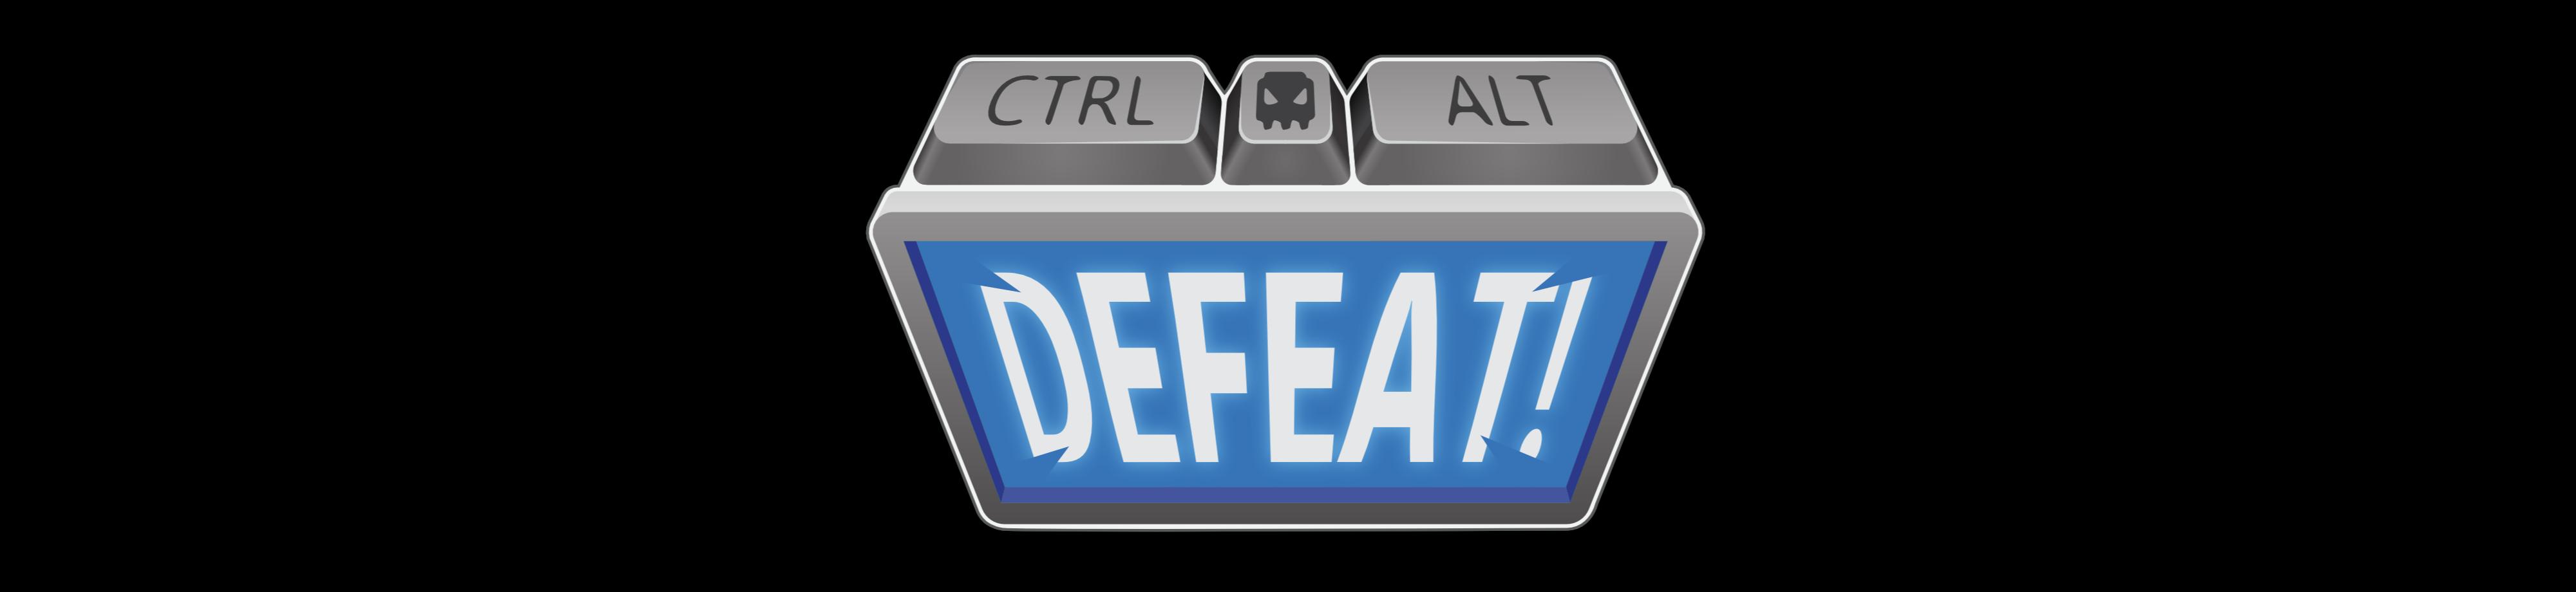 Ctrl Alt Defeat!